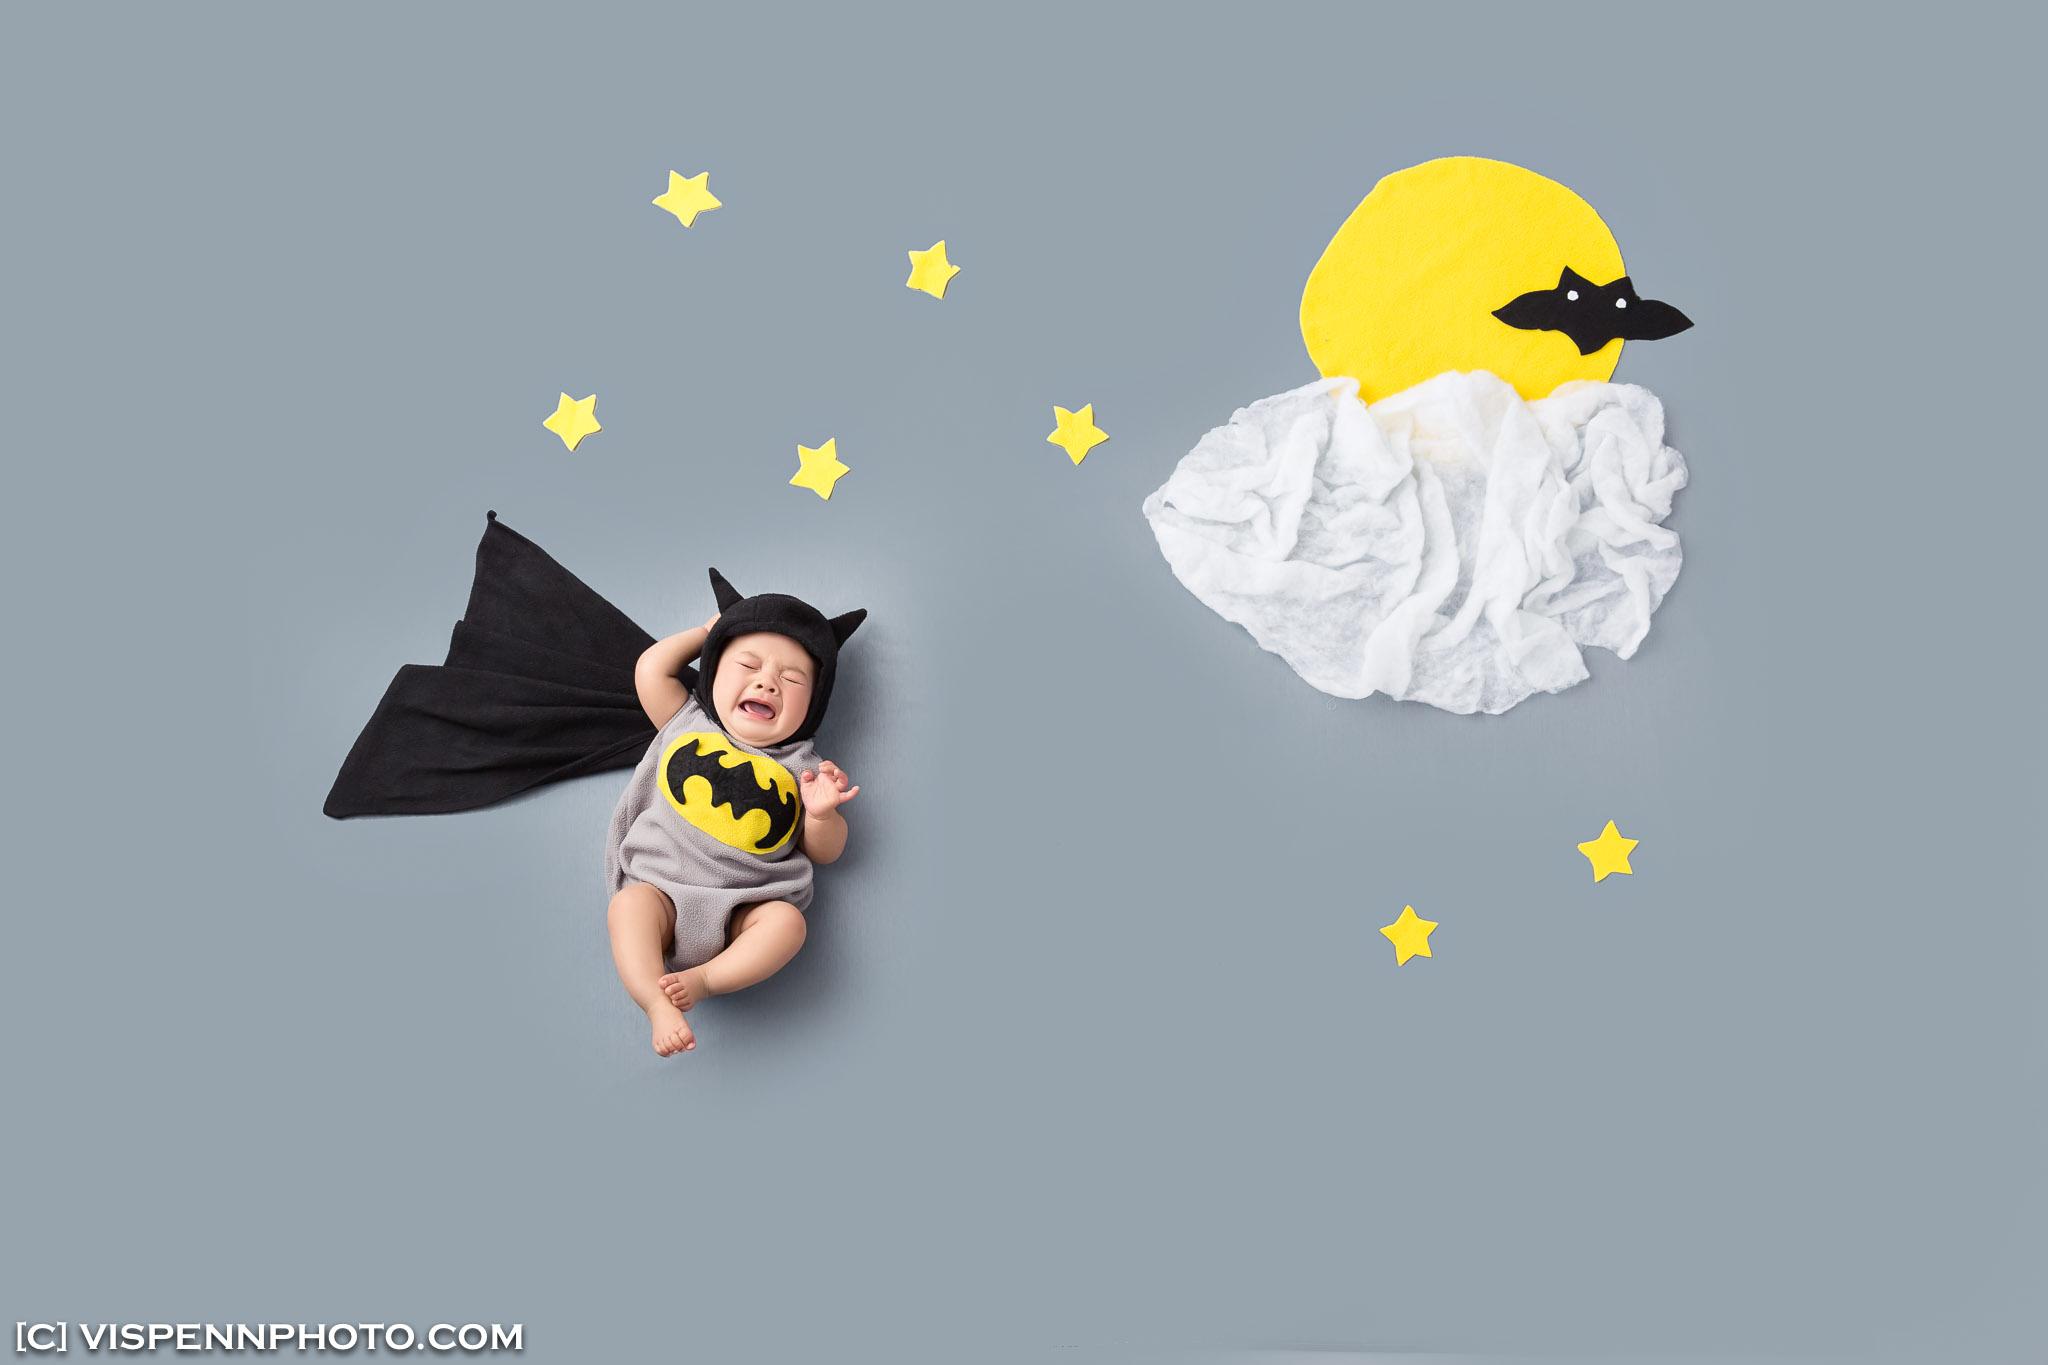 Melbourne Newborn Baby Family Photo BaoBao VISPENN 墨尔本 儿童 宝宝 百天照 满月照 孕妇照 全家福 100DAYS SerinaDING 1628 VISPENN